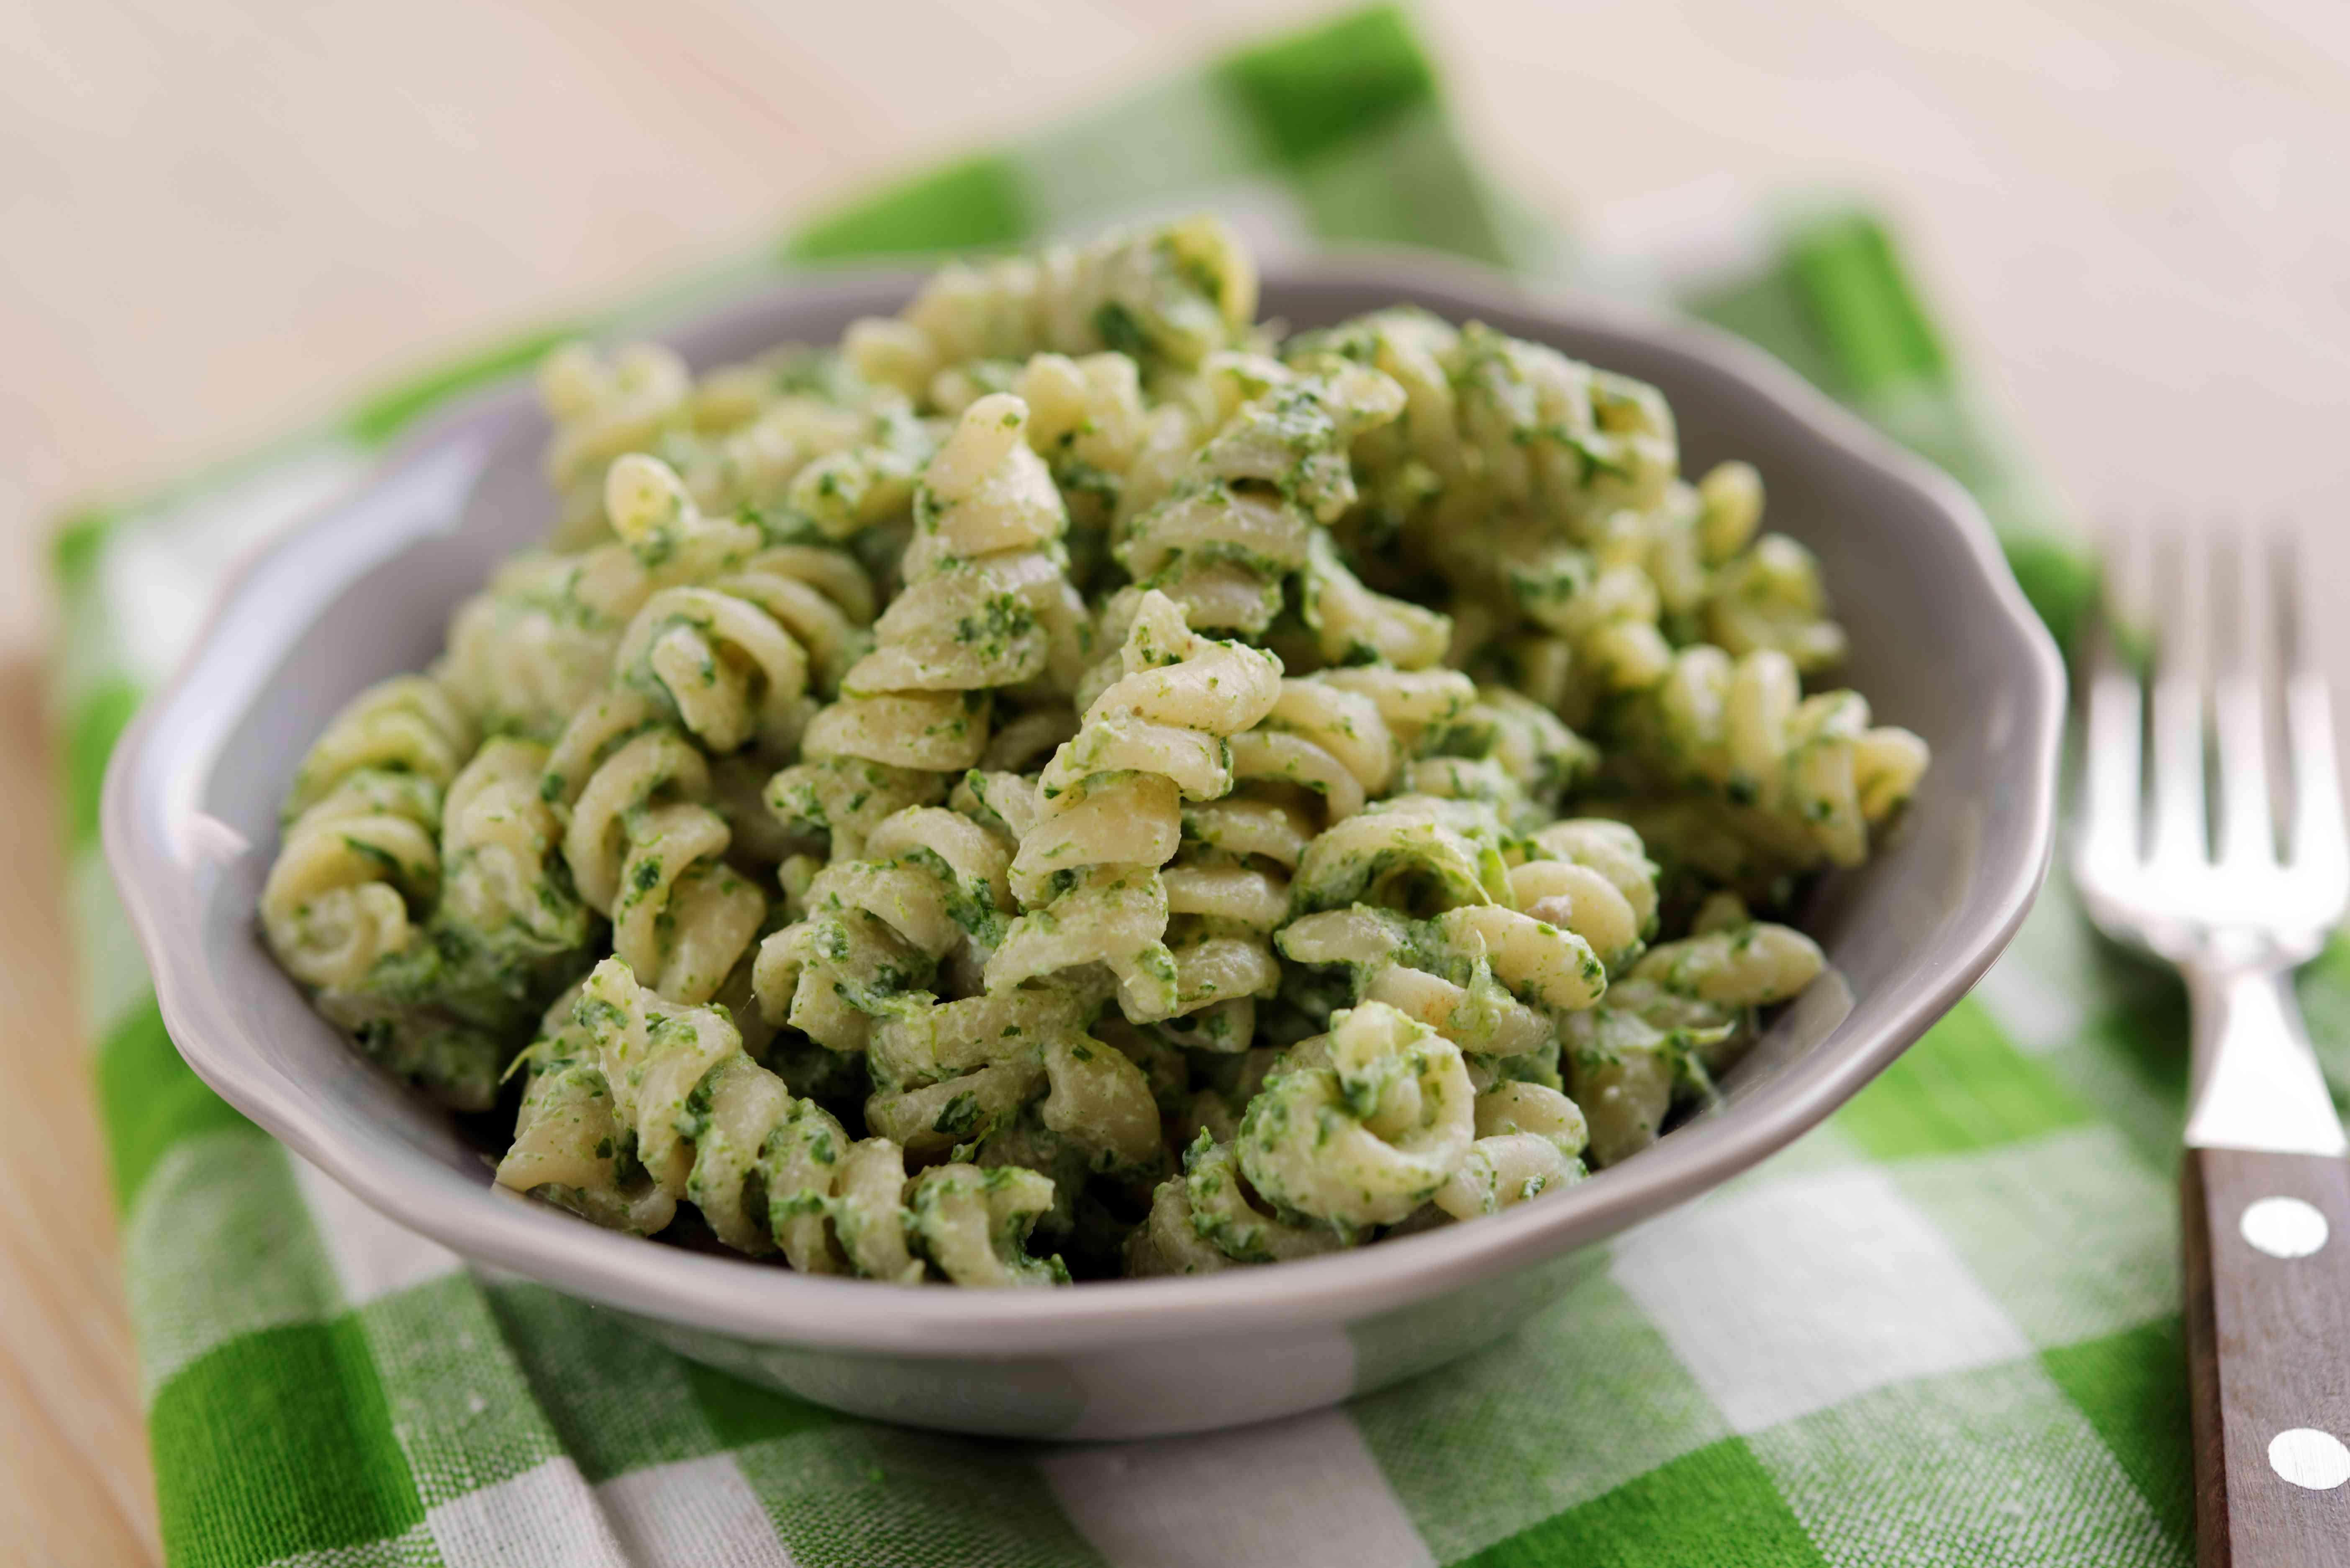 Fusilli pasta with spinach and ricotta